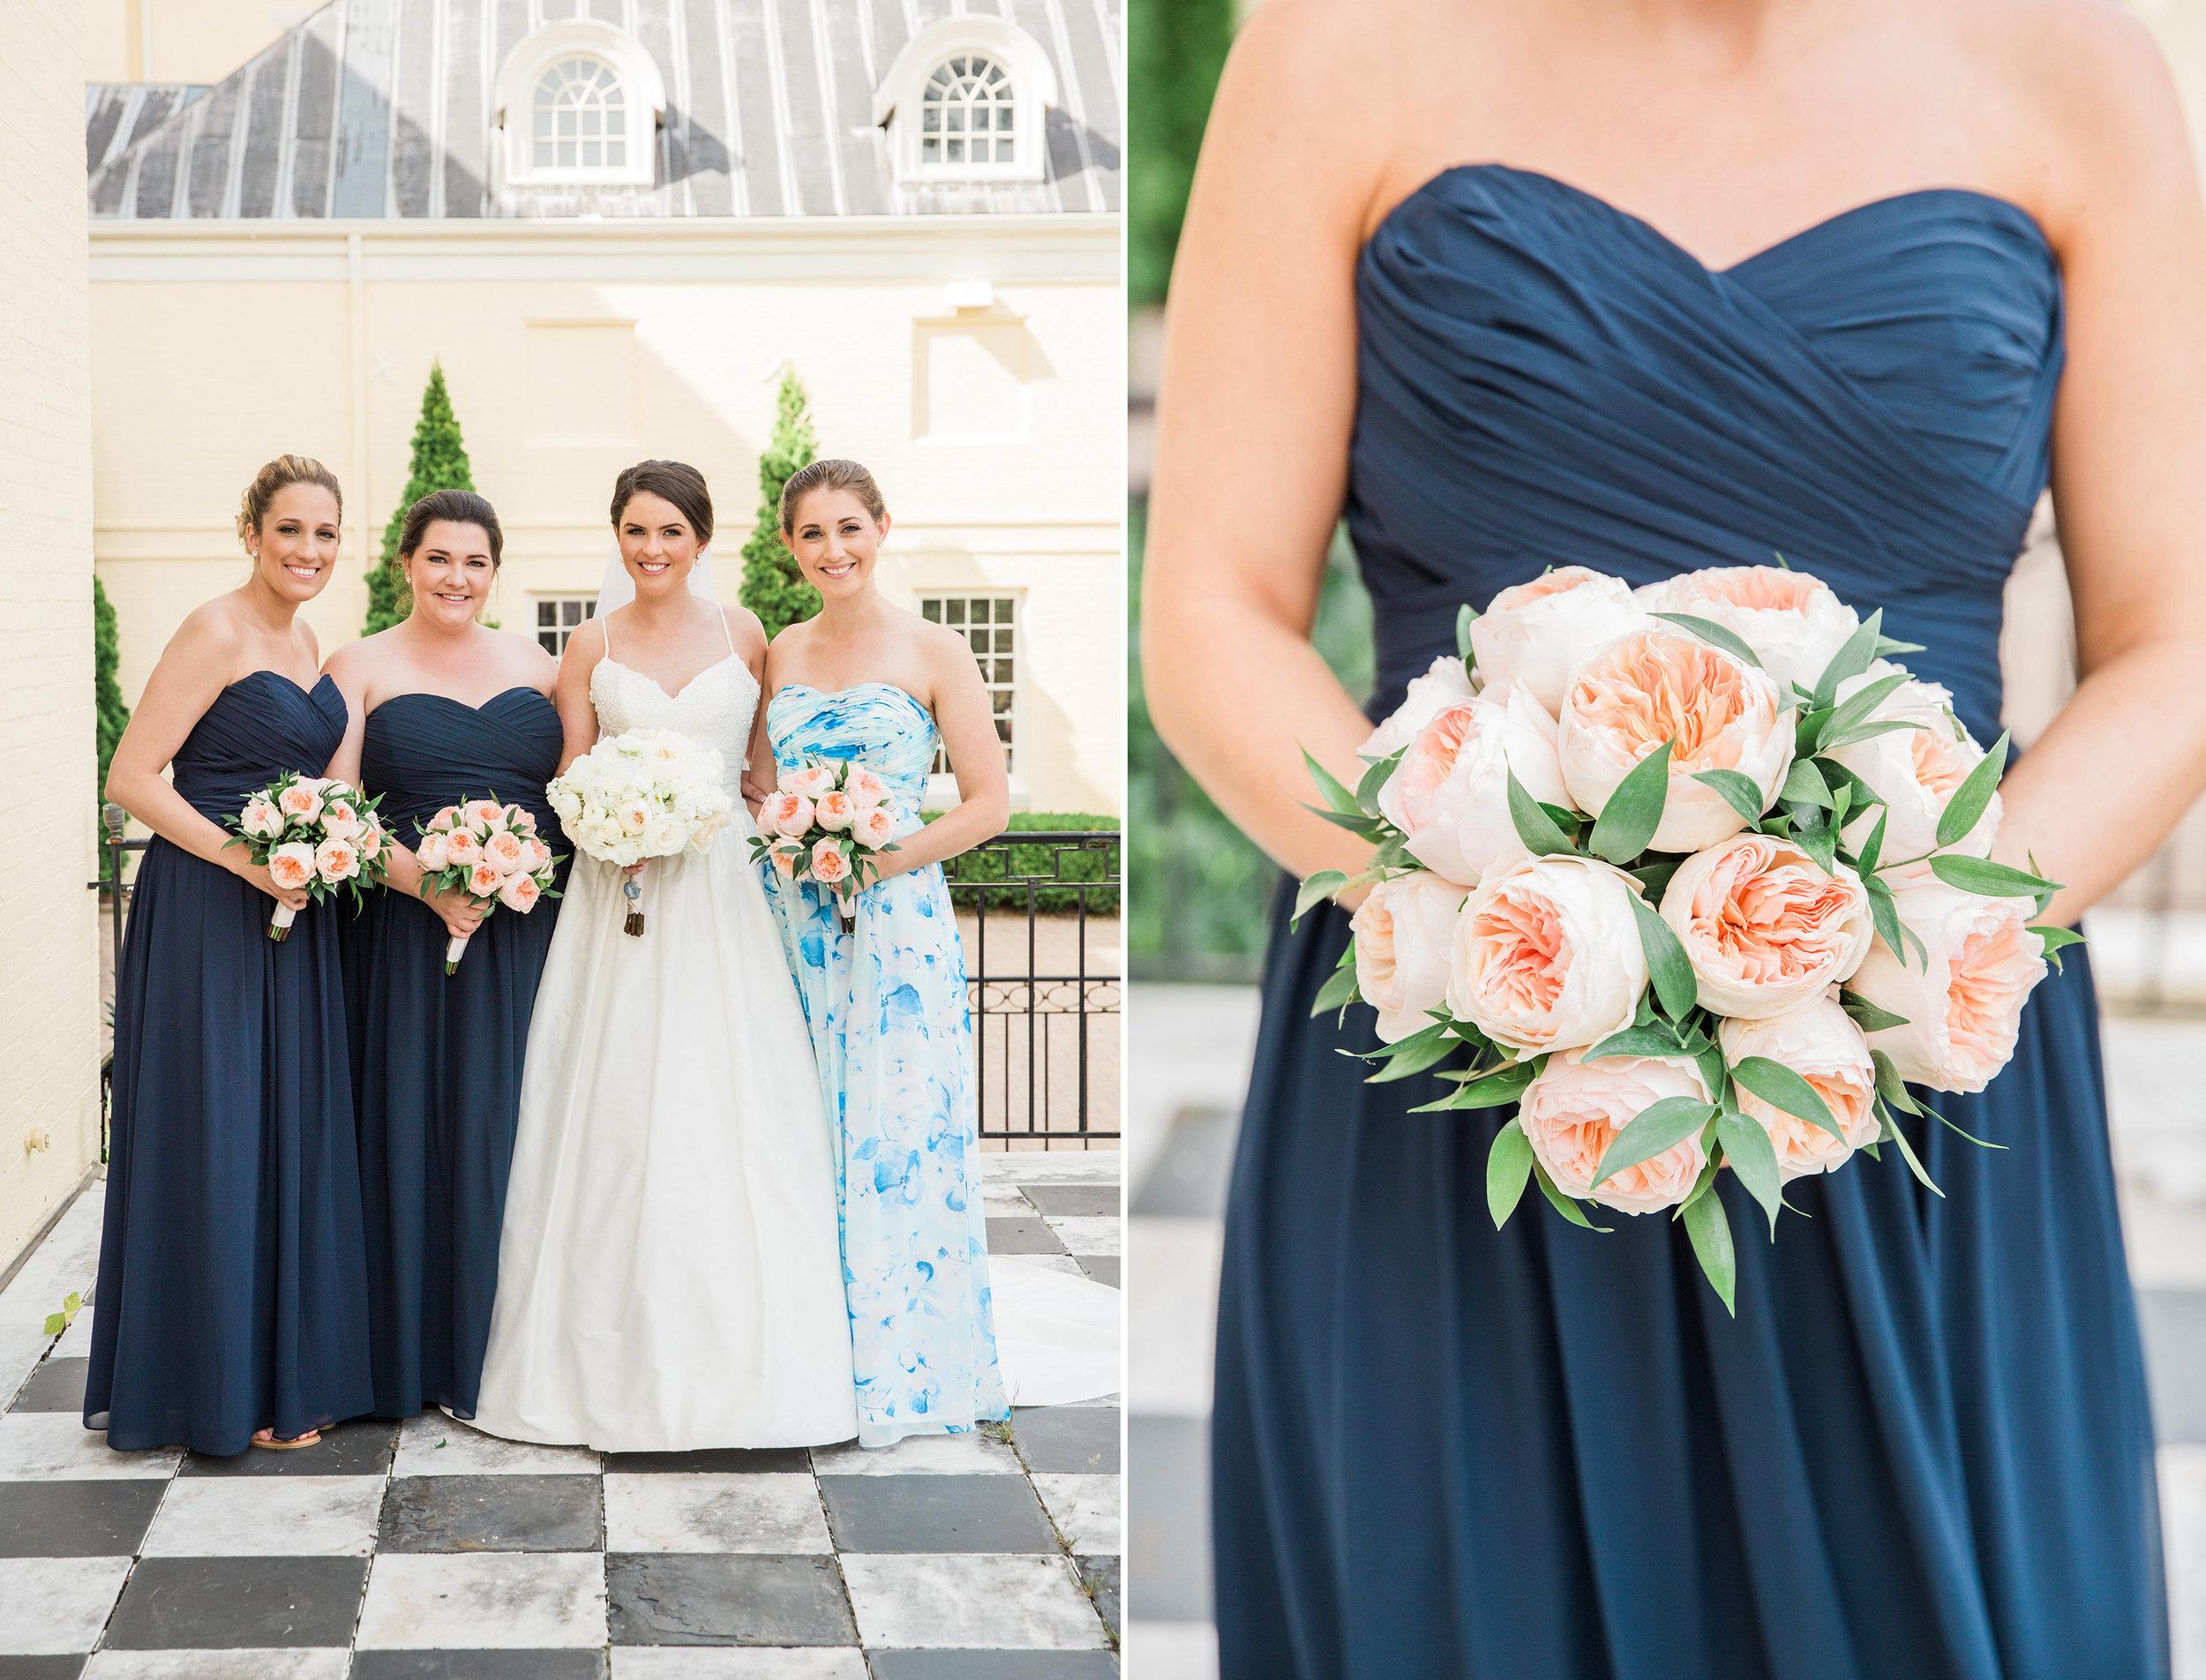 Evergreen-Museum-Balitmore-Maryland-Wedding-Black-Tie-Bride-015.jpg